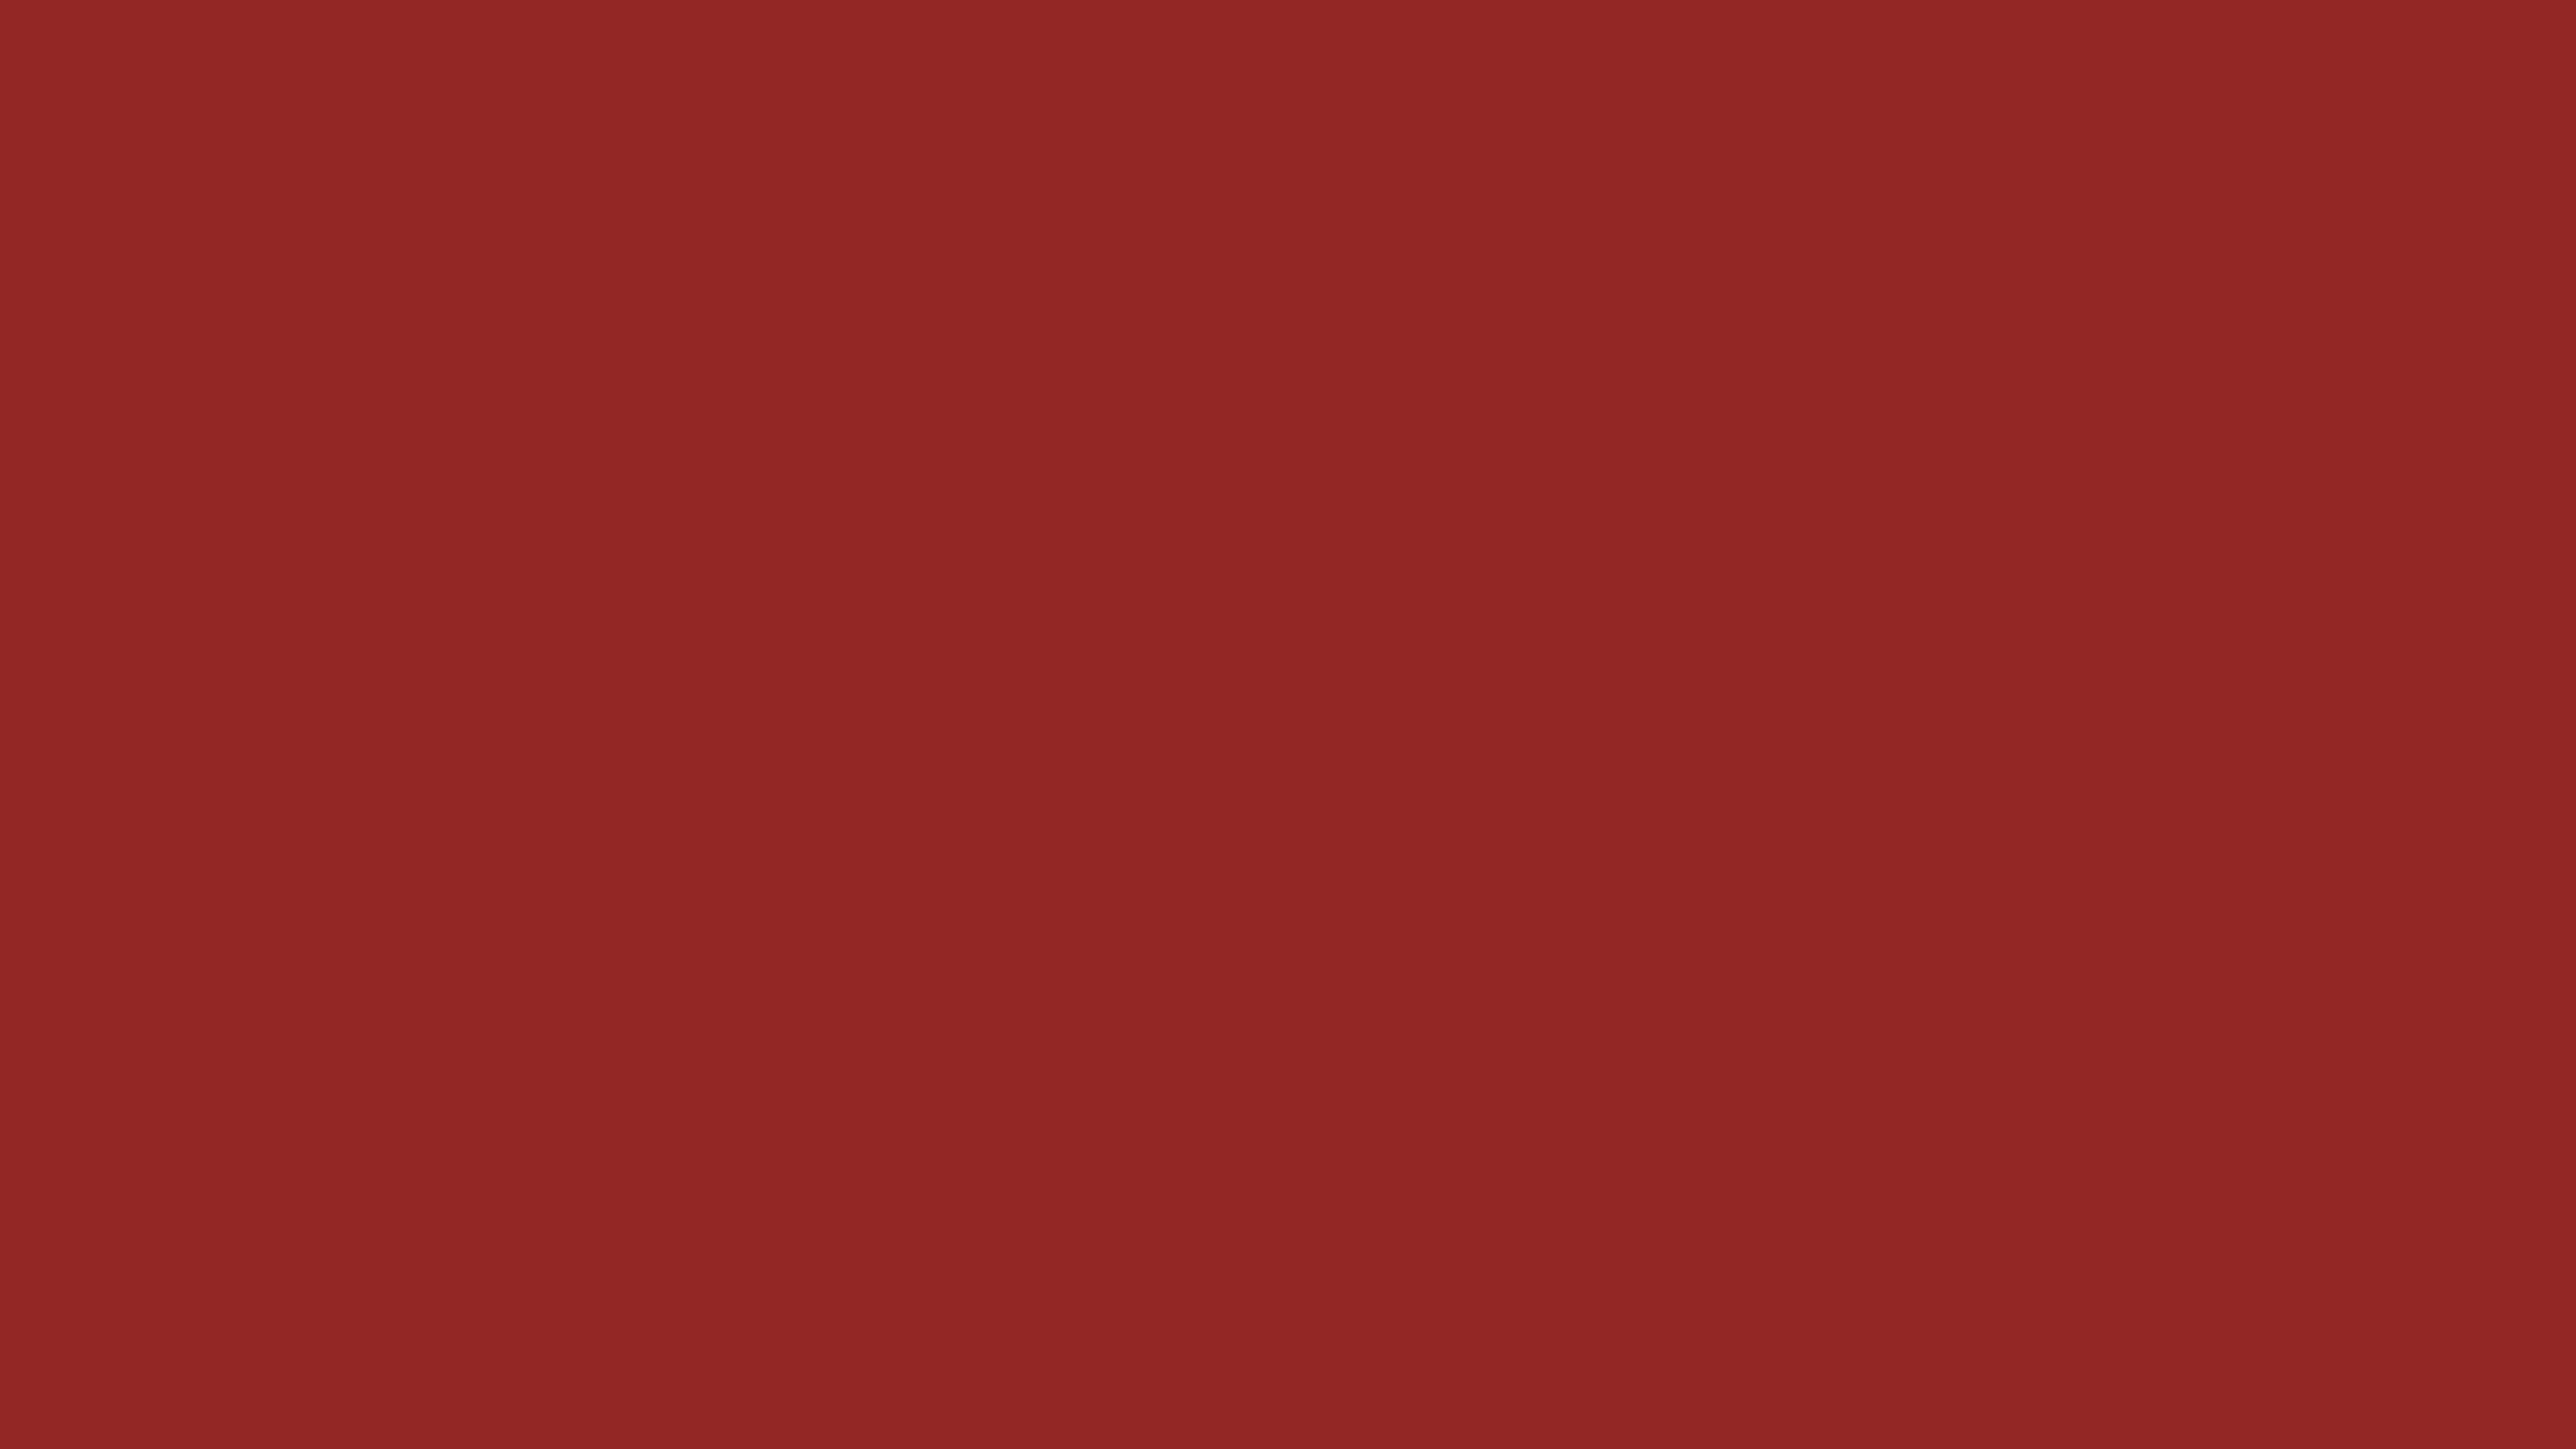 7680x4320 Vivid Auburn Solid Color Background